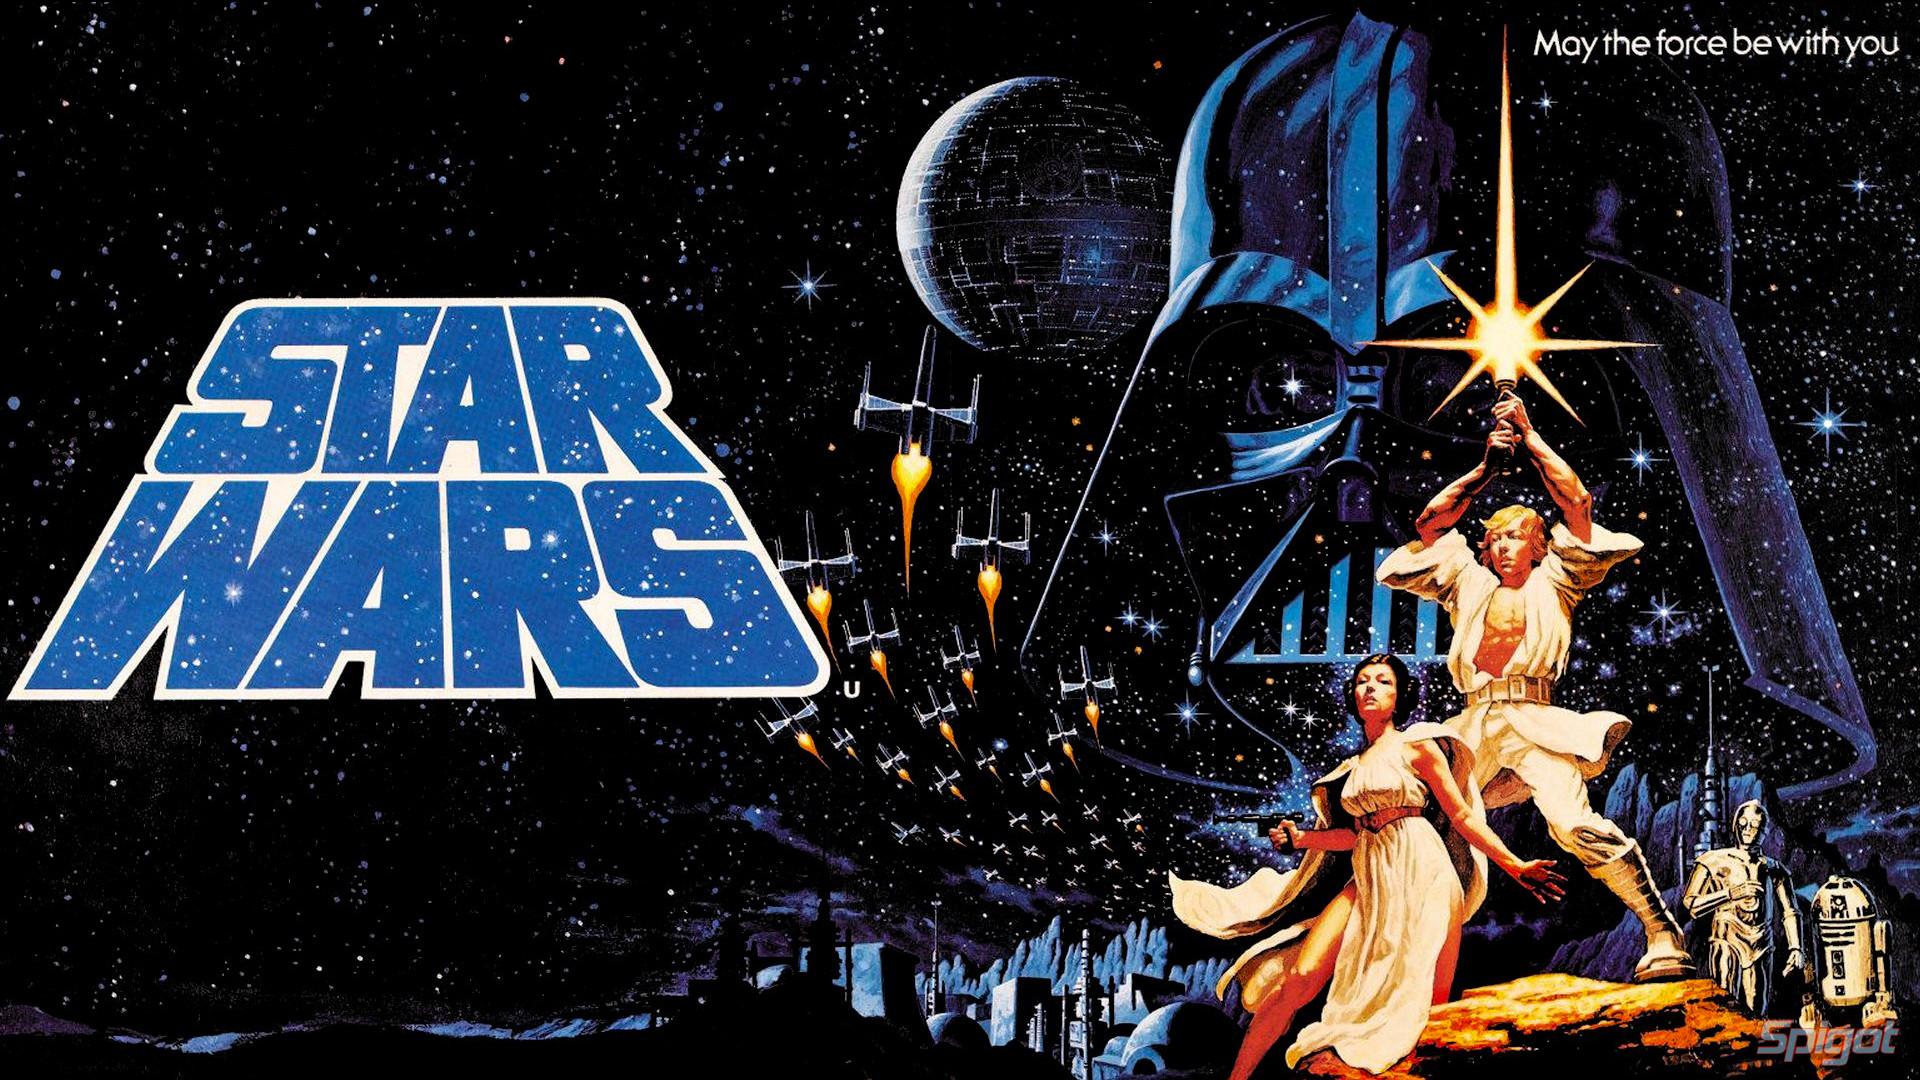 Star wars – 02